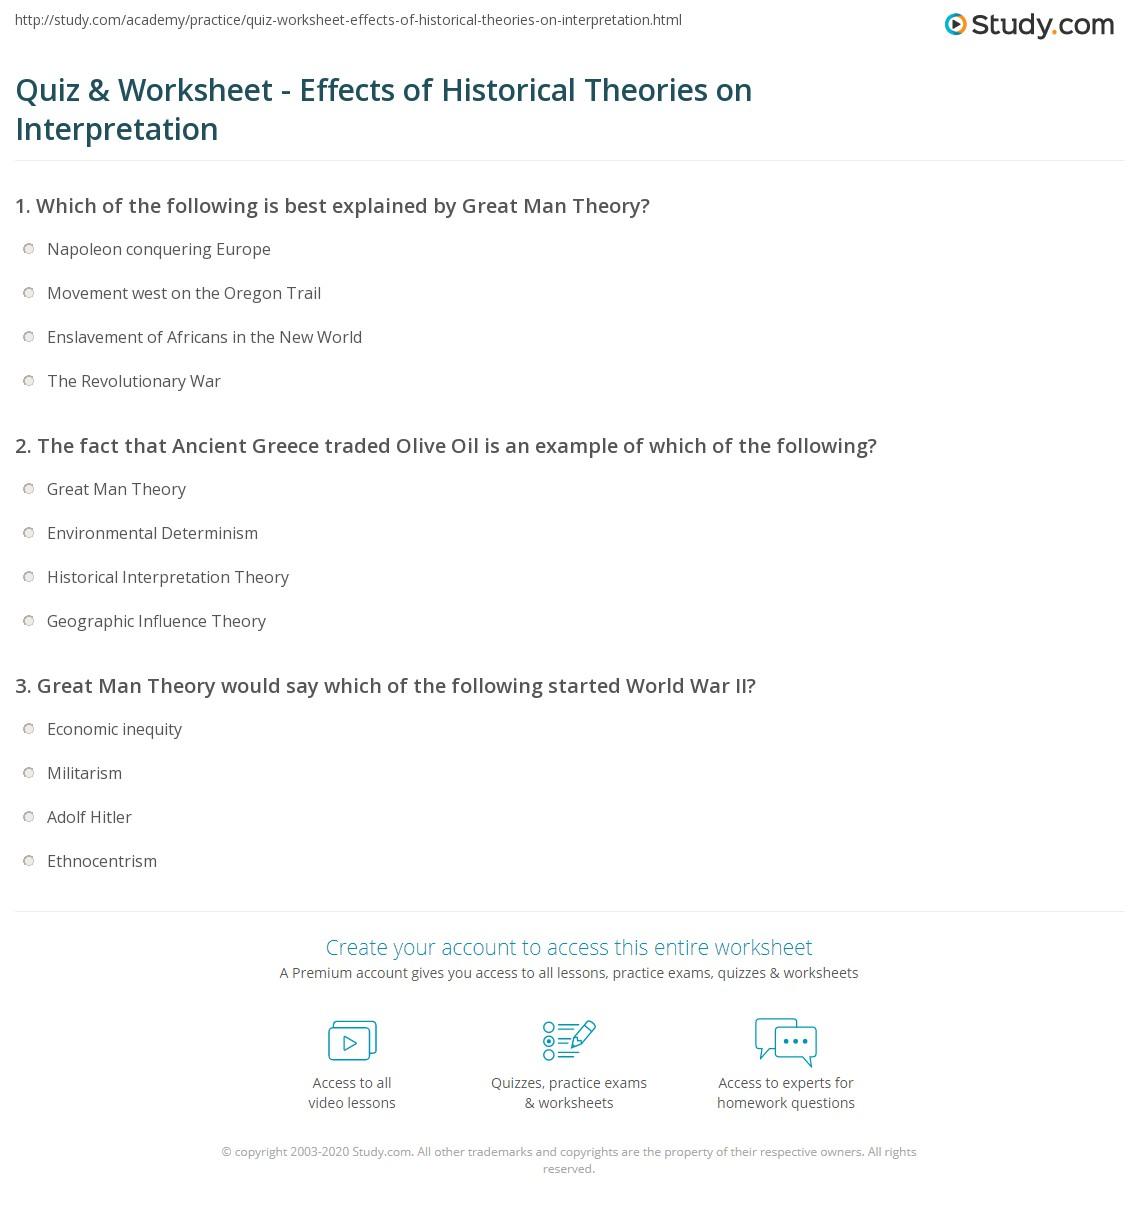 Quiz Worksheet Effects Of Historical Theories On Interpretation